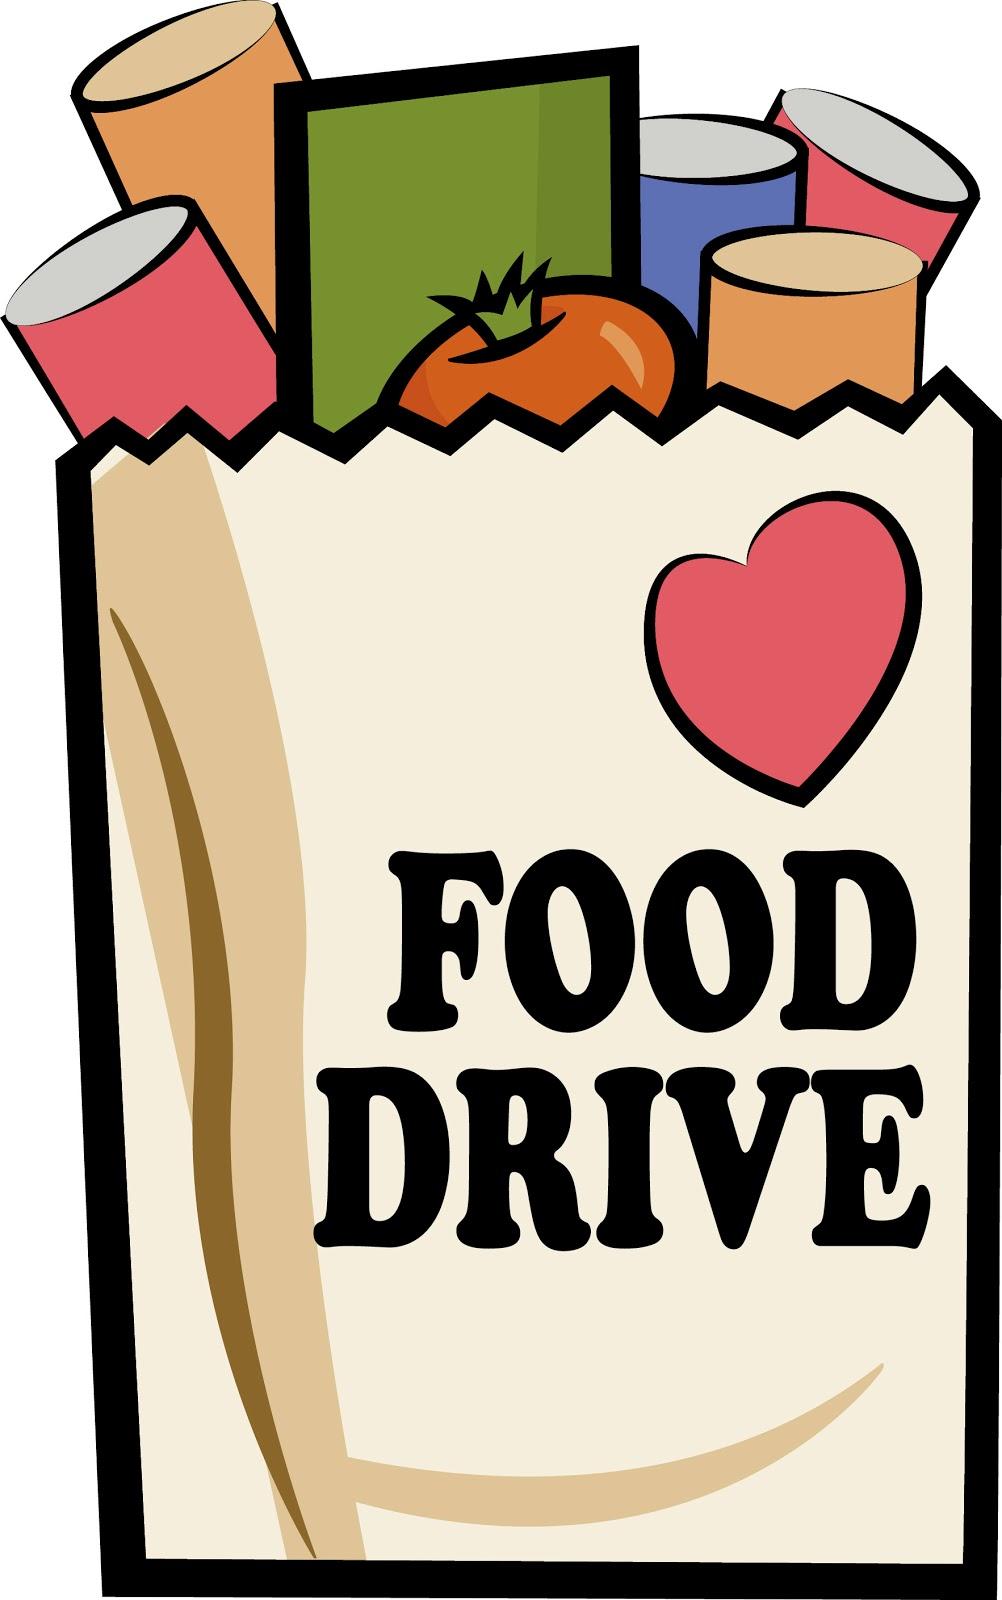 canned food drive posters-canned food drive posters-6